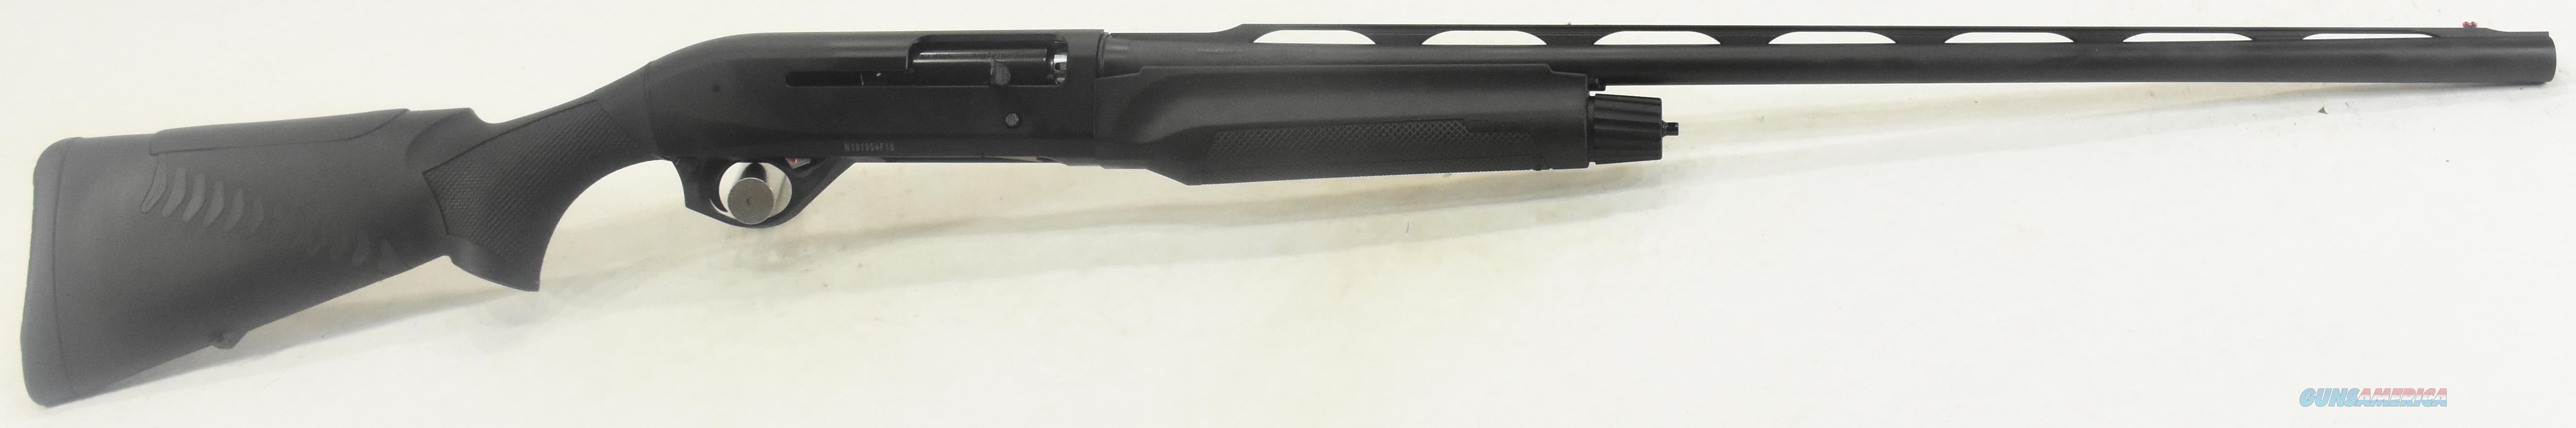 11095 Benelli M2 Field Black Synthetic 20 Ga 26-3In  Guns > Shotguns > Benelli Shotguns > Sporting